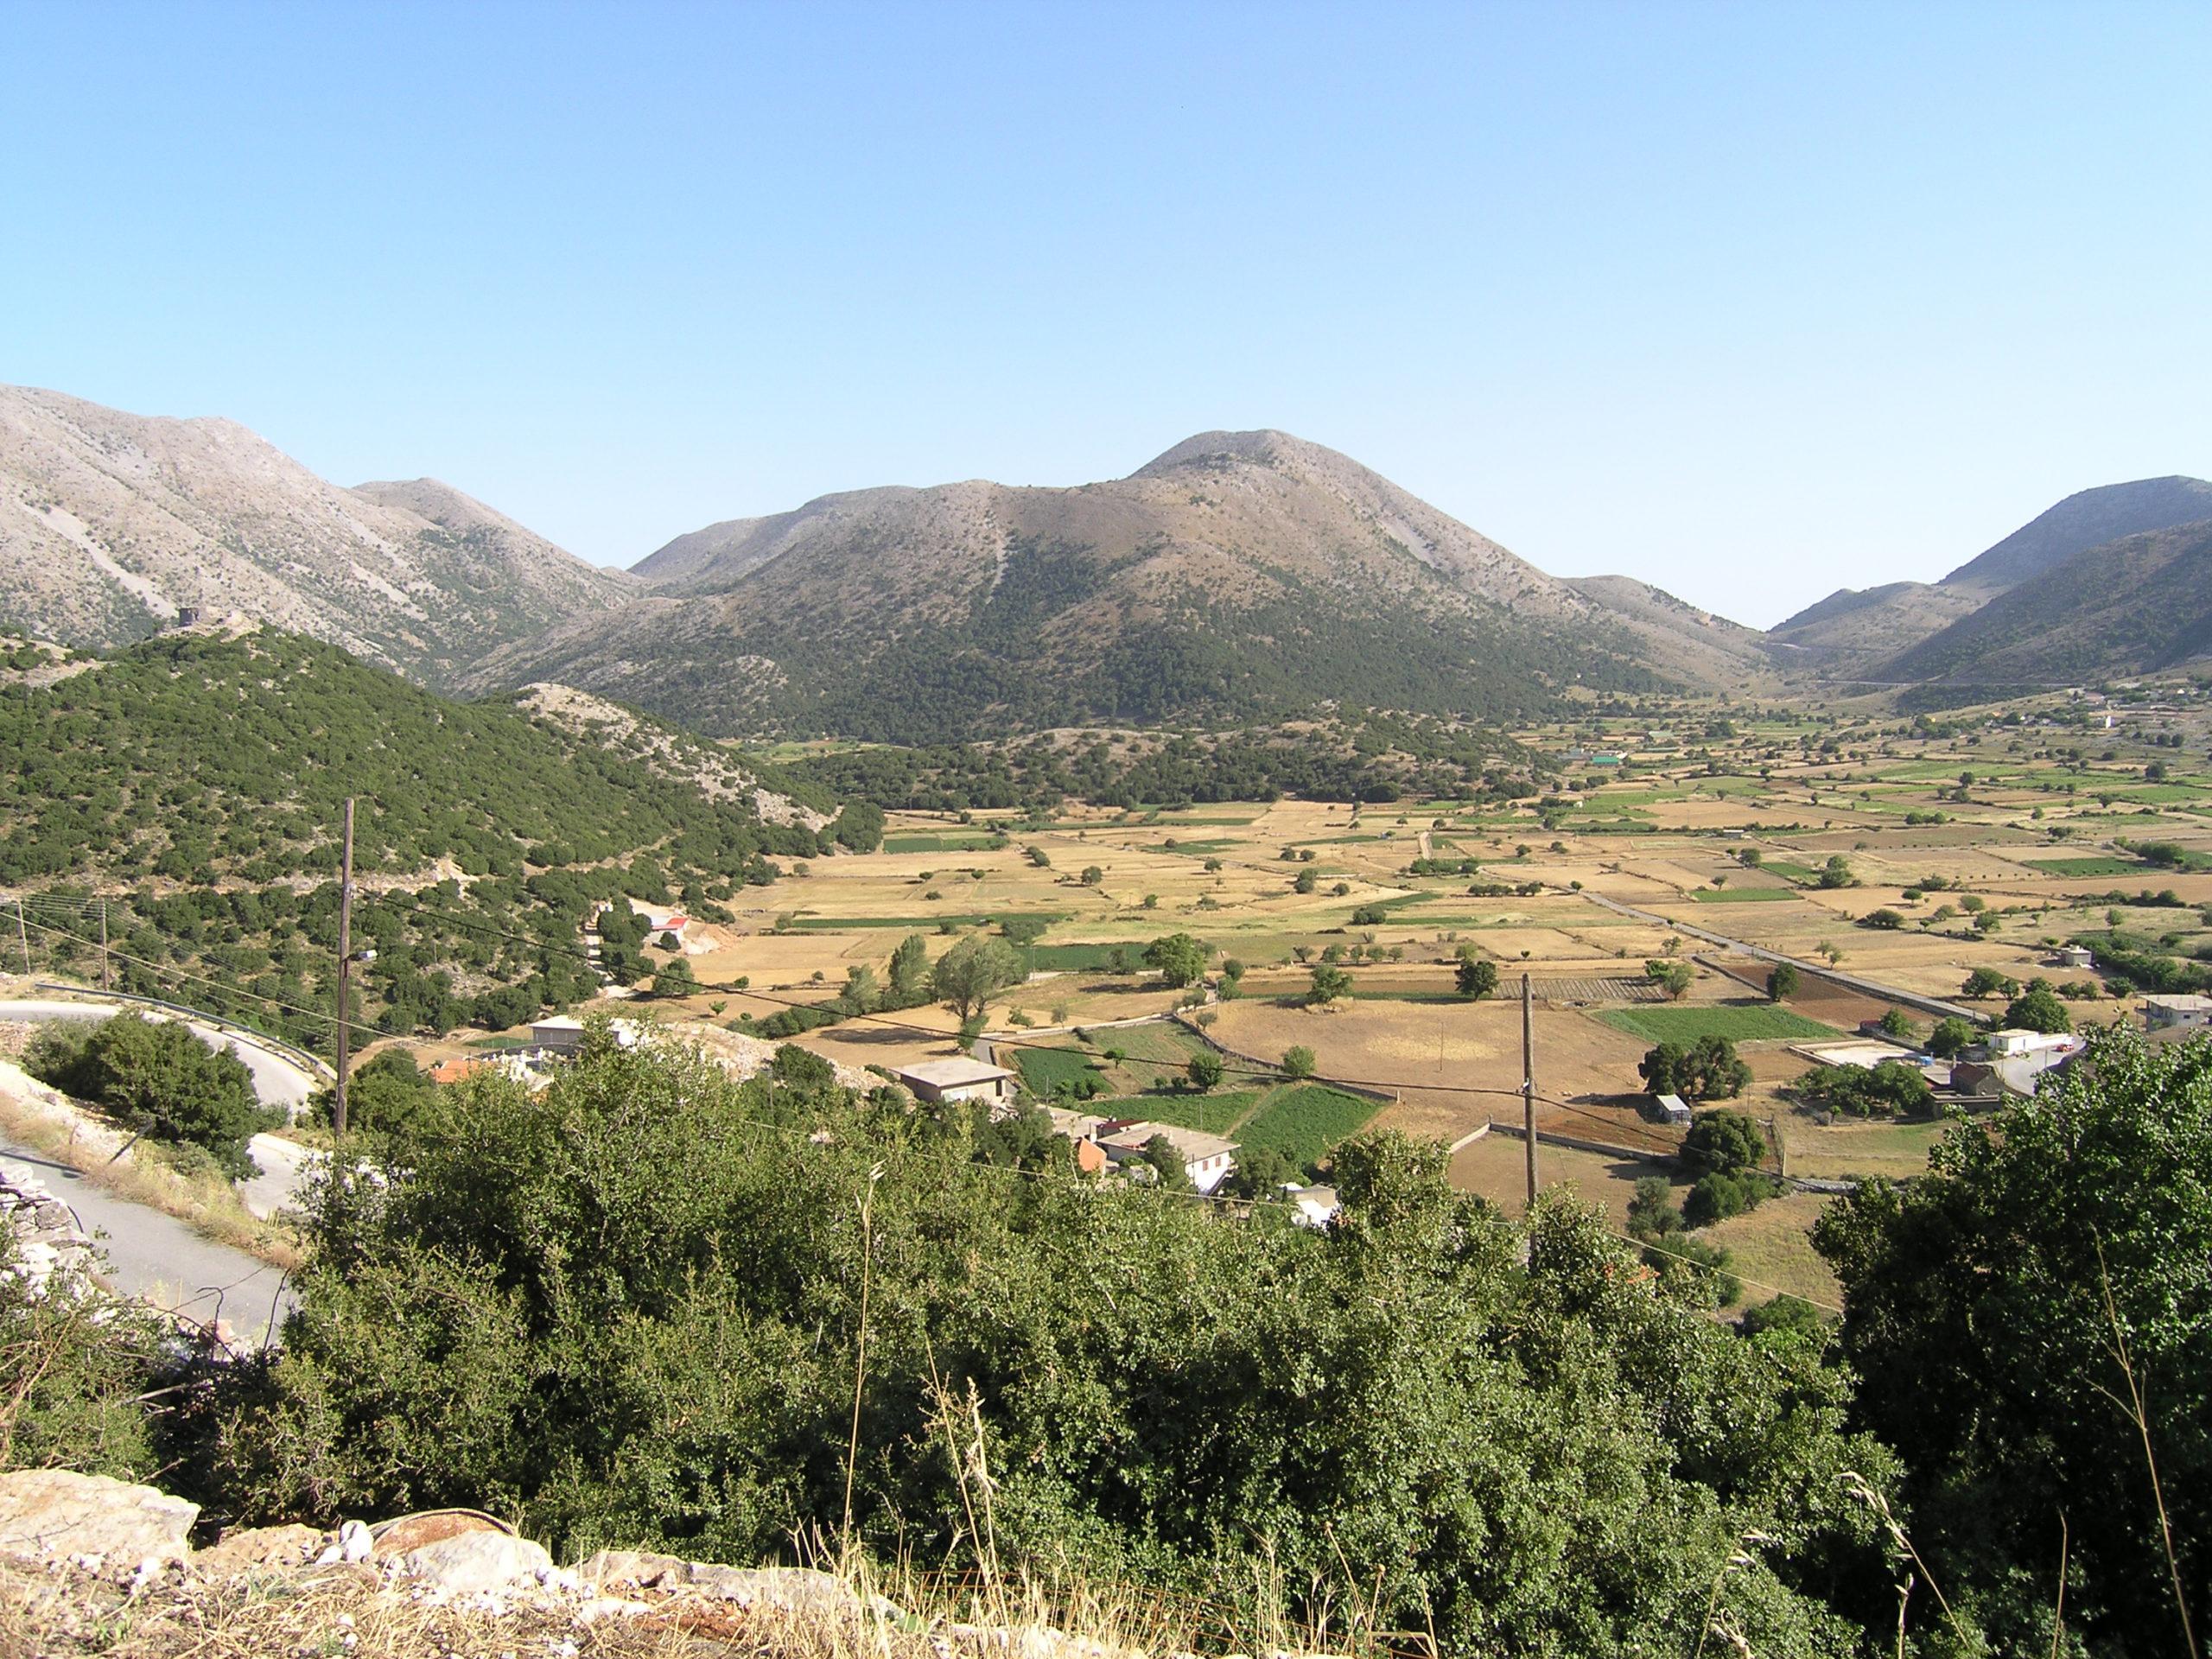 Panorama na pola i góry